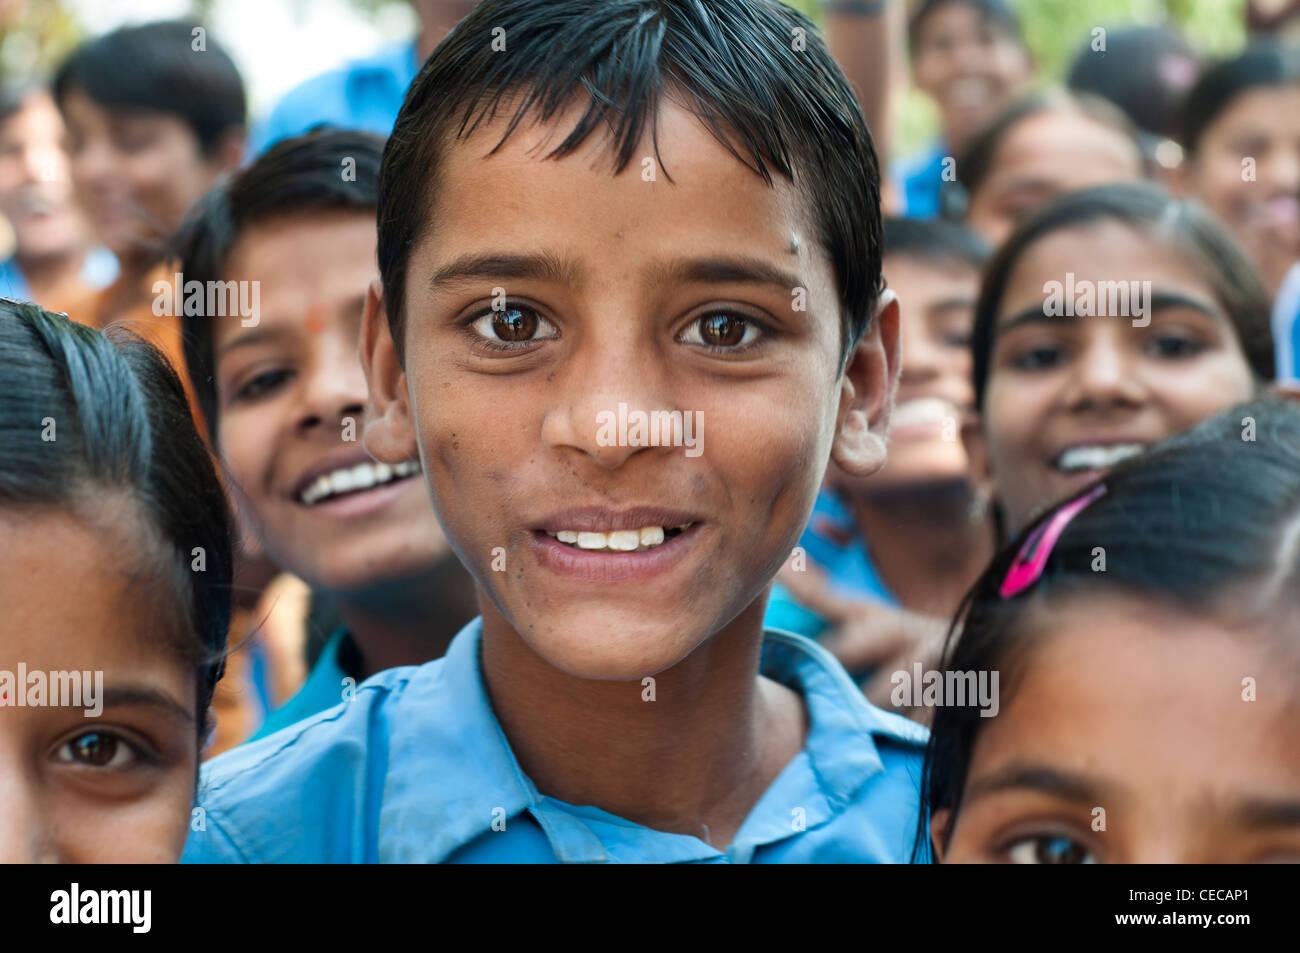 Children in courtyard, Village school near Jaipur, Rajasthan, India - Stock Image